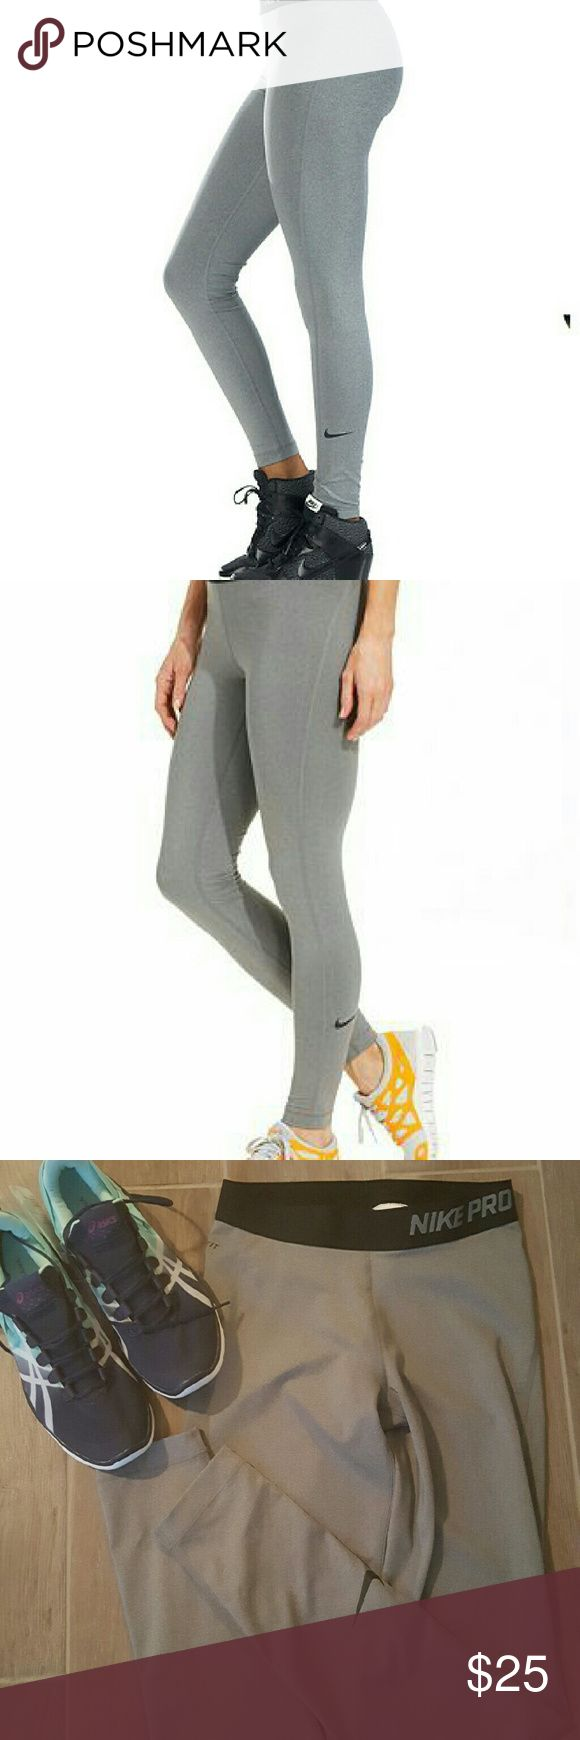 Nike Pro Dri-Fit Leggings Ladies size small Nike Pro Dri-Fit leggings.  Worn once, in excellent condition. Nike Pants Leggings